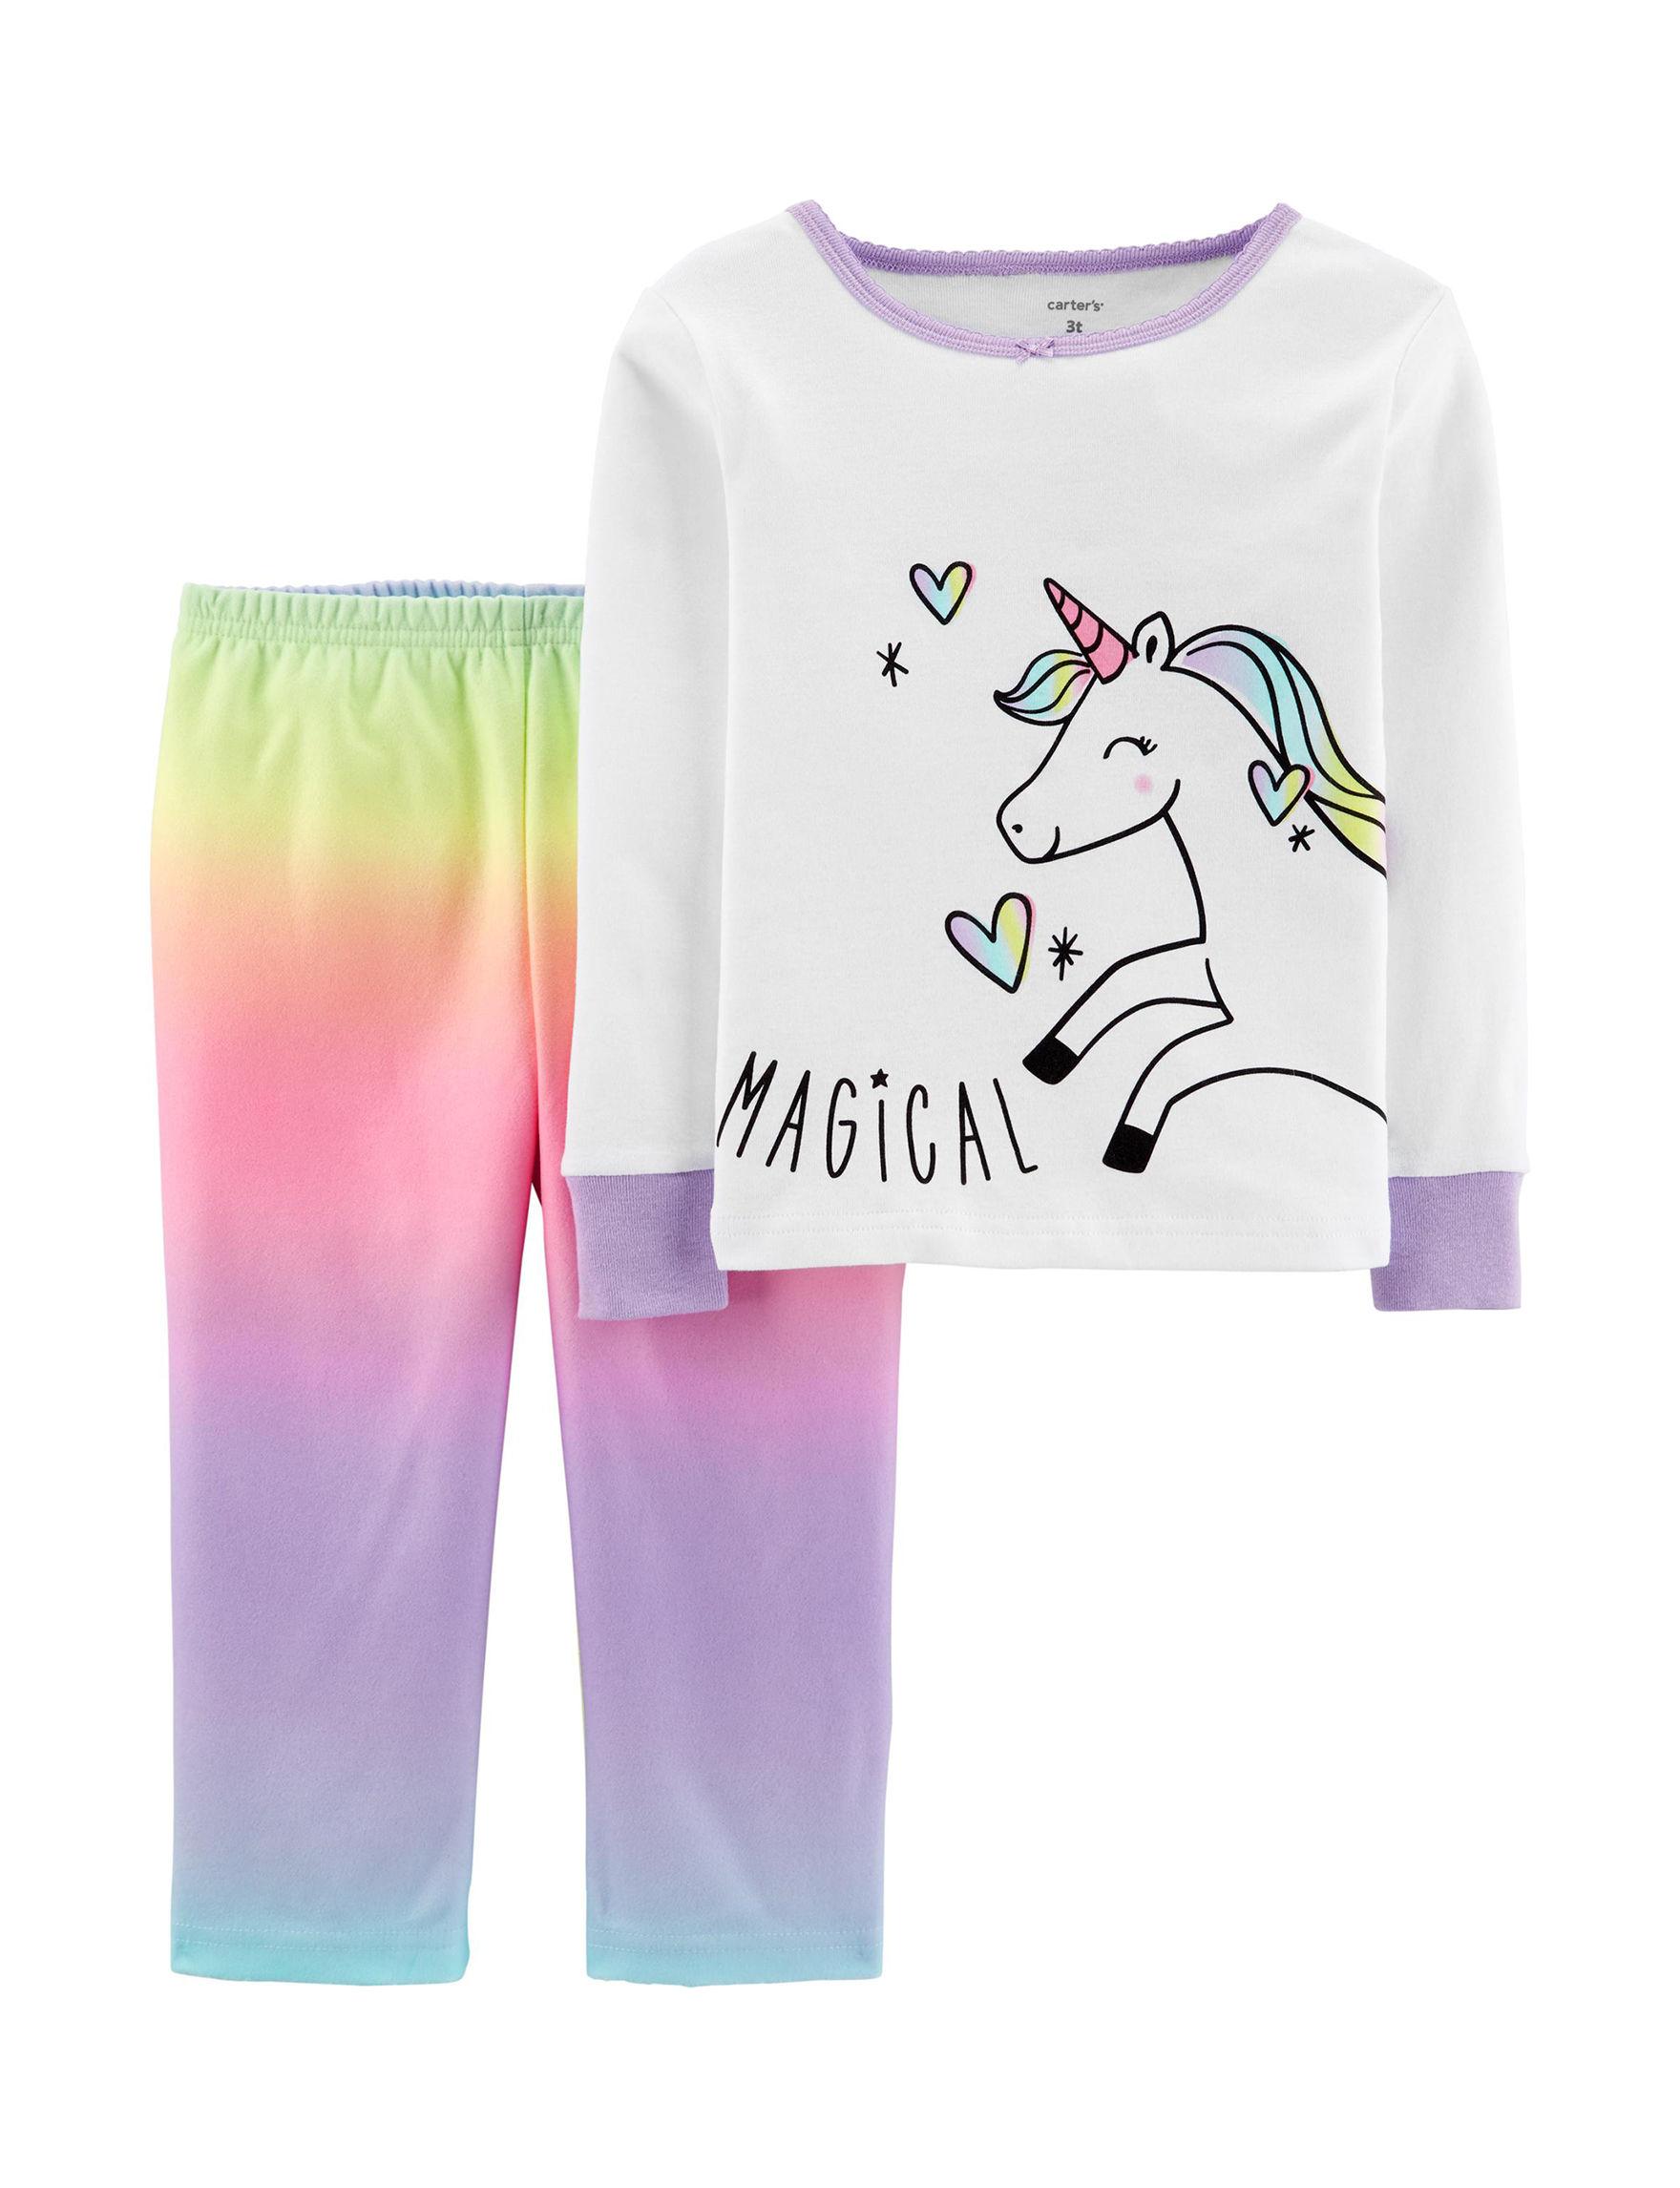 Carter's Rainbow Pajama Sets